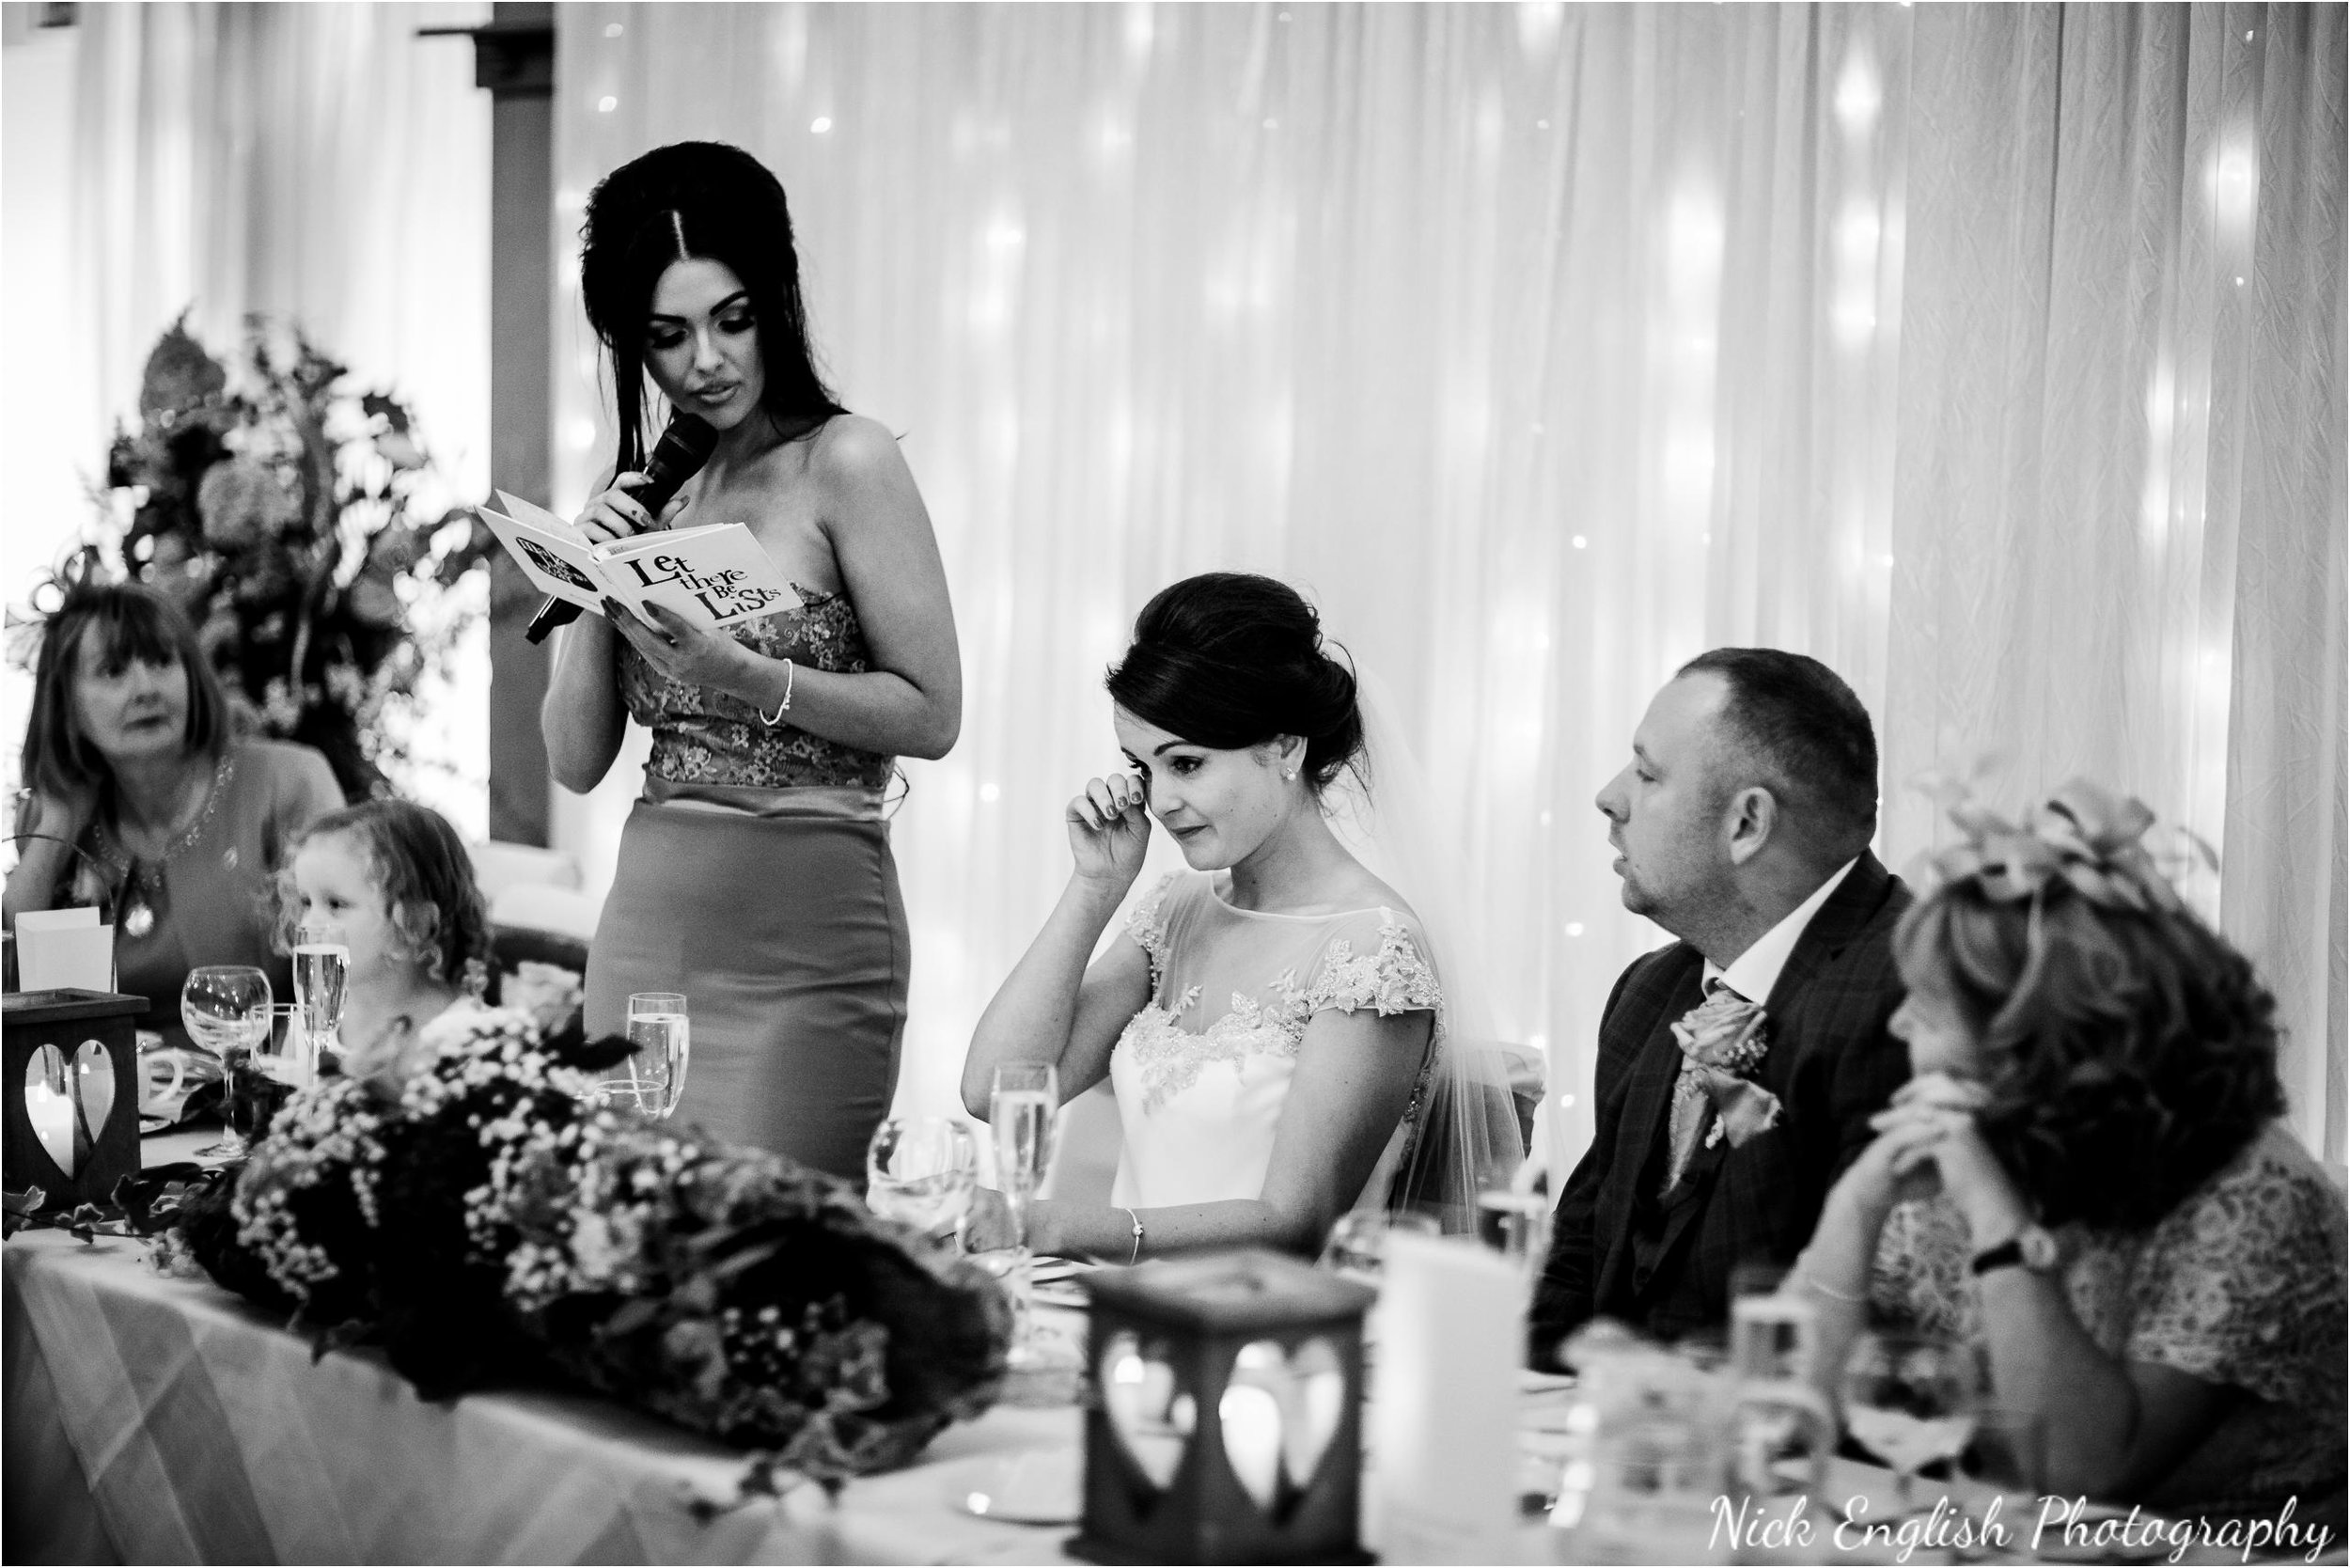 Stacey-Ash-Wedding-Photographs-Stanley-House-Preston-Lancashire-156.jpg